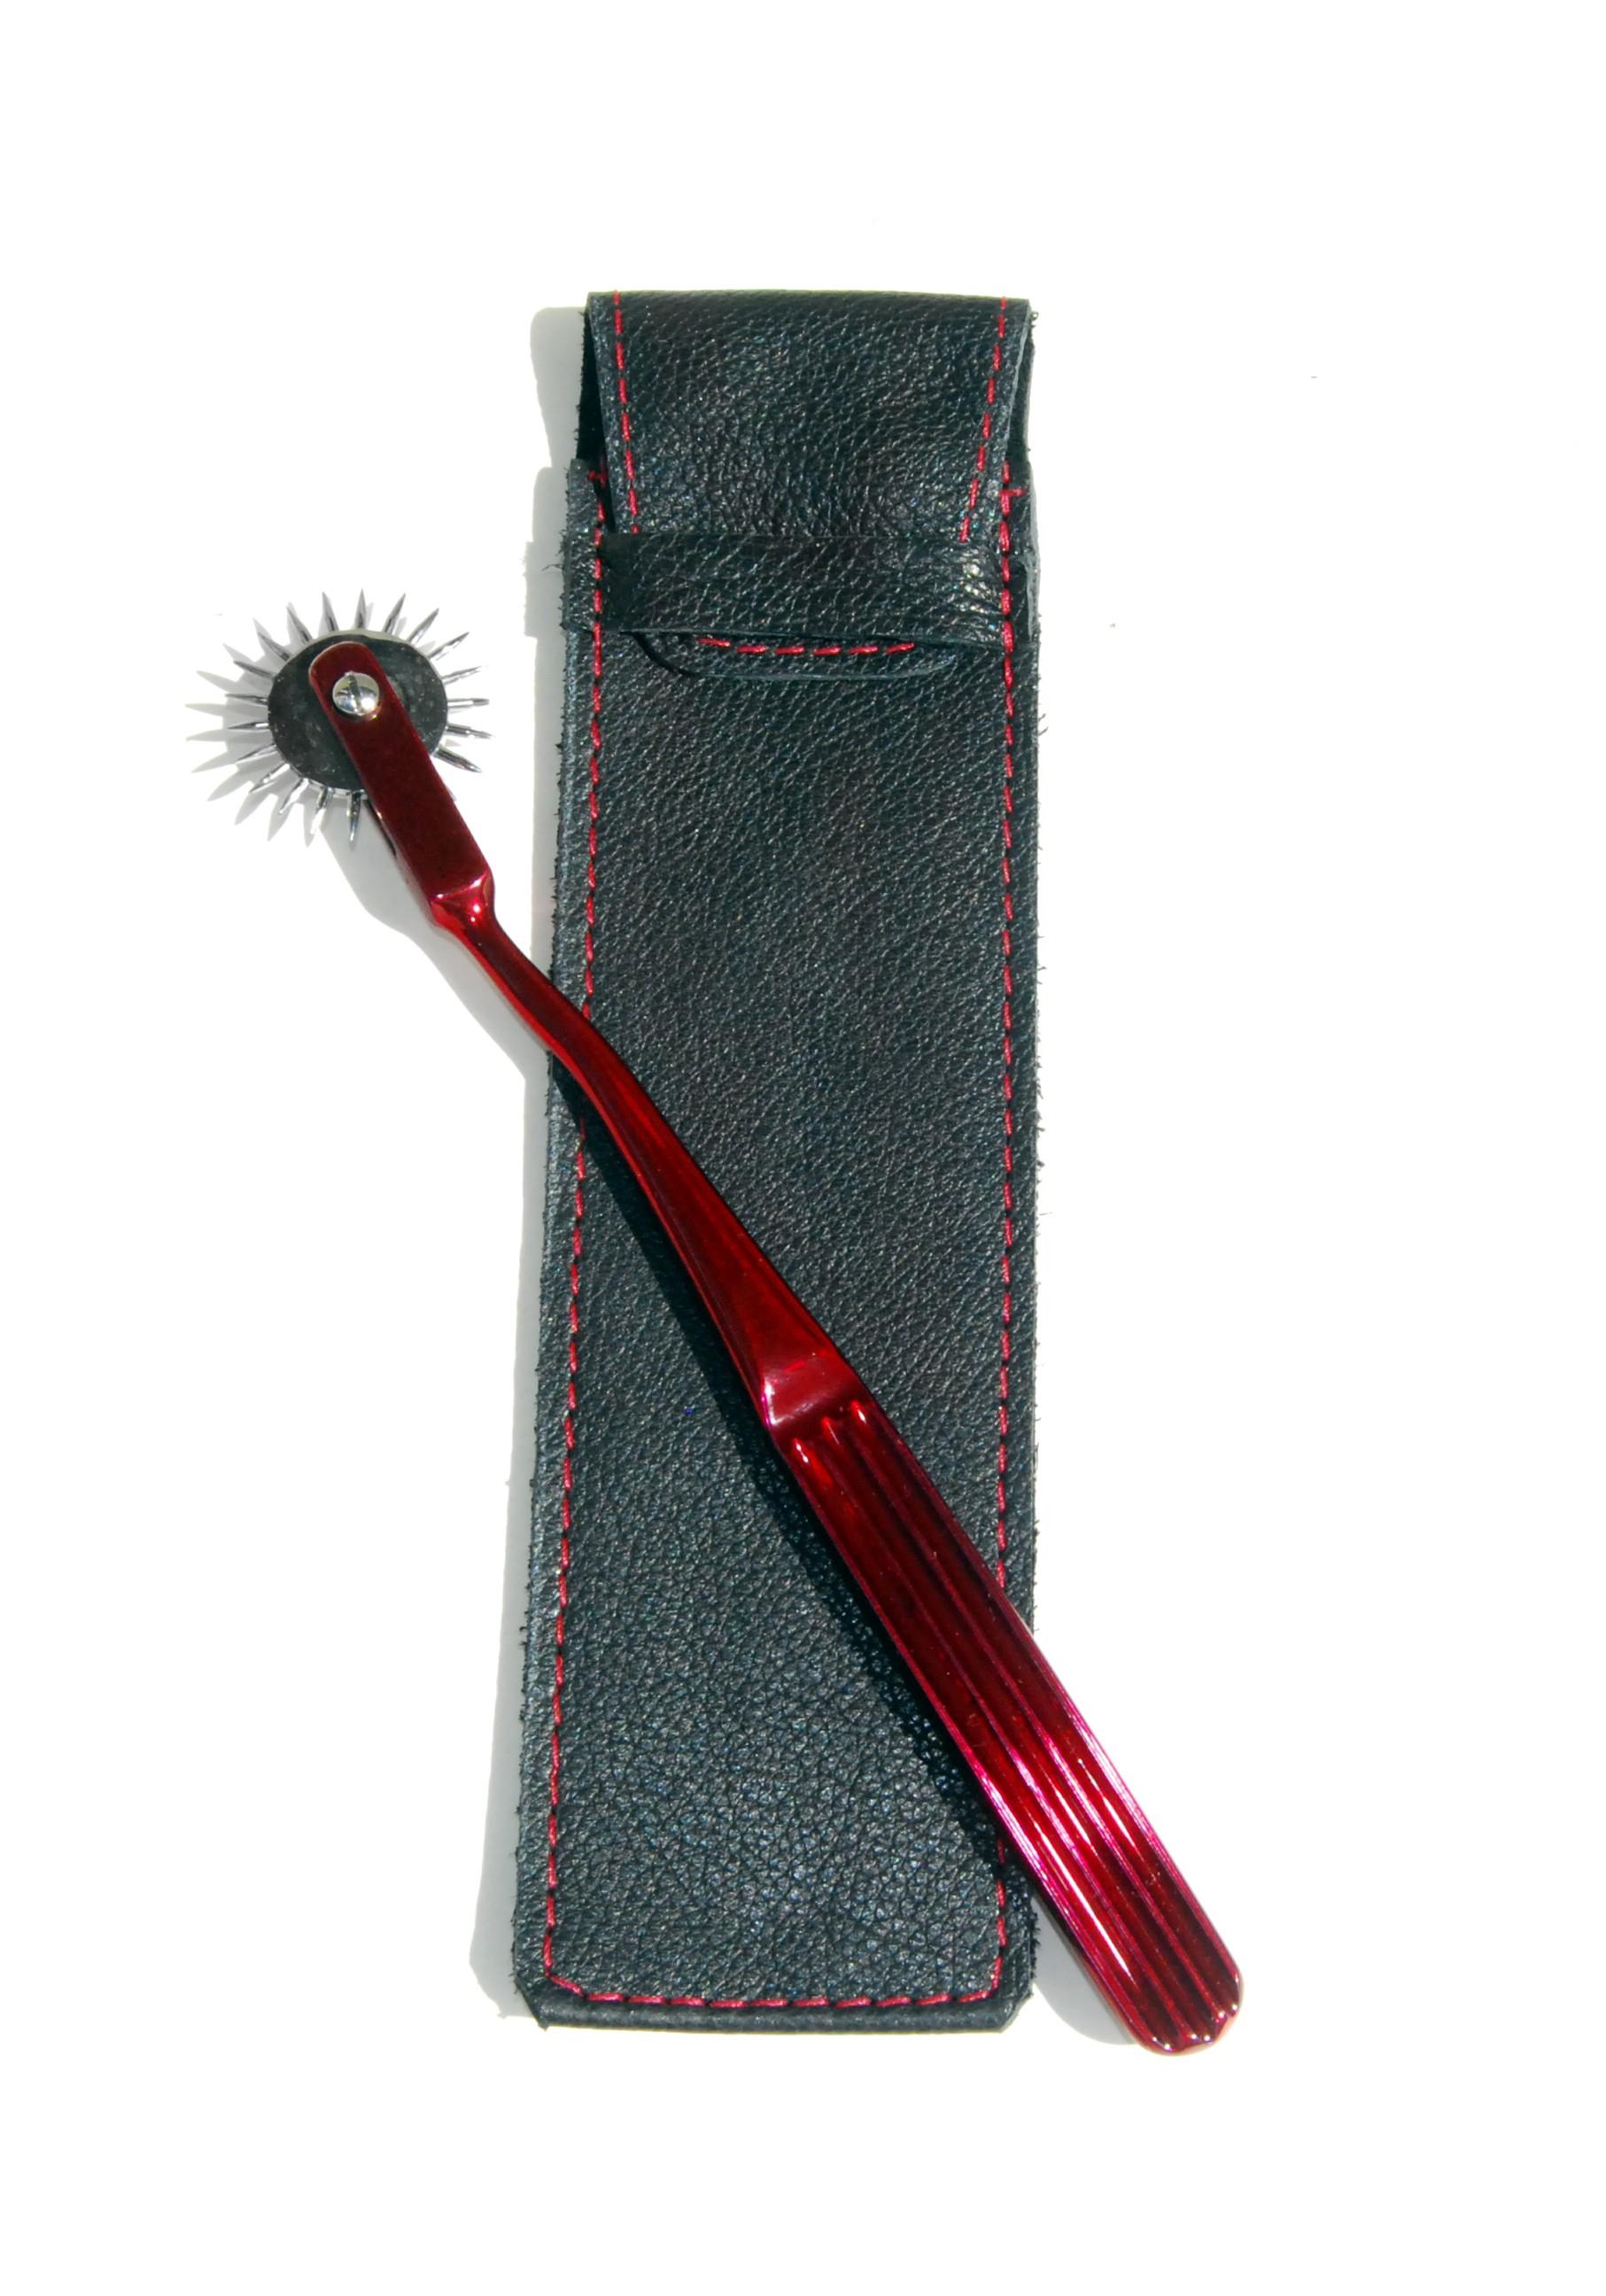 limited edition red wartenberg pinwheel